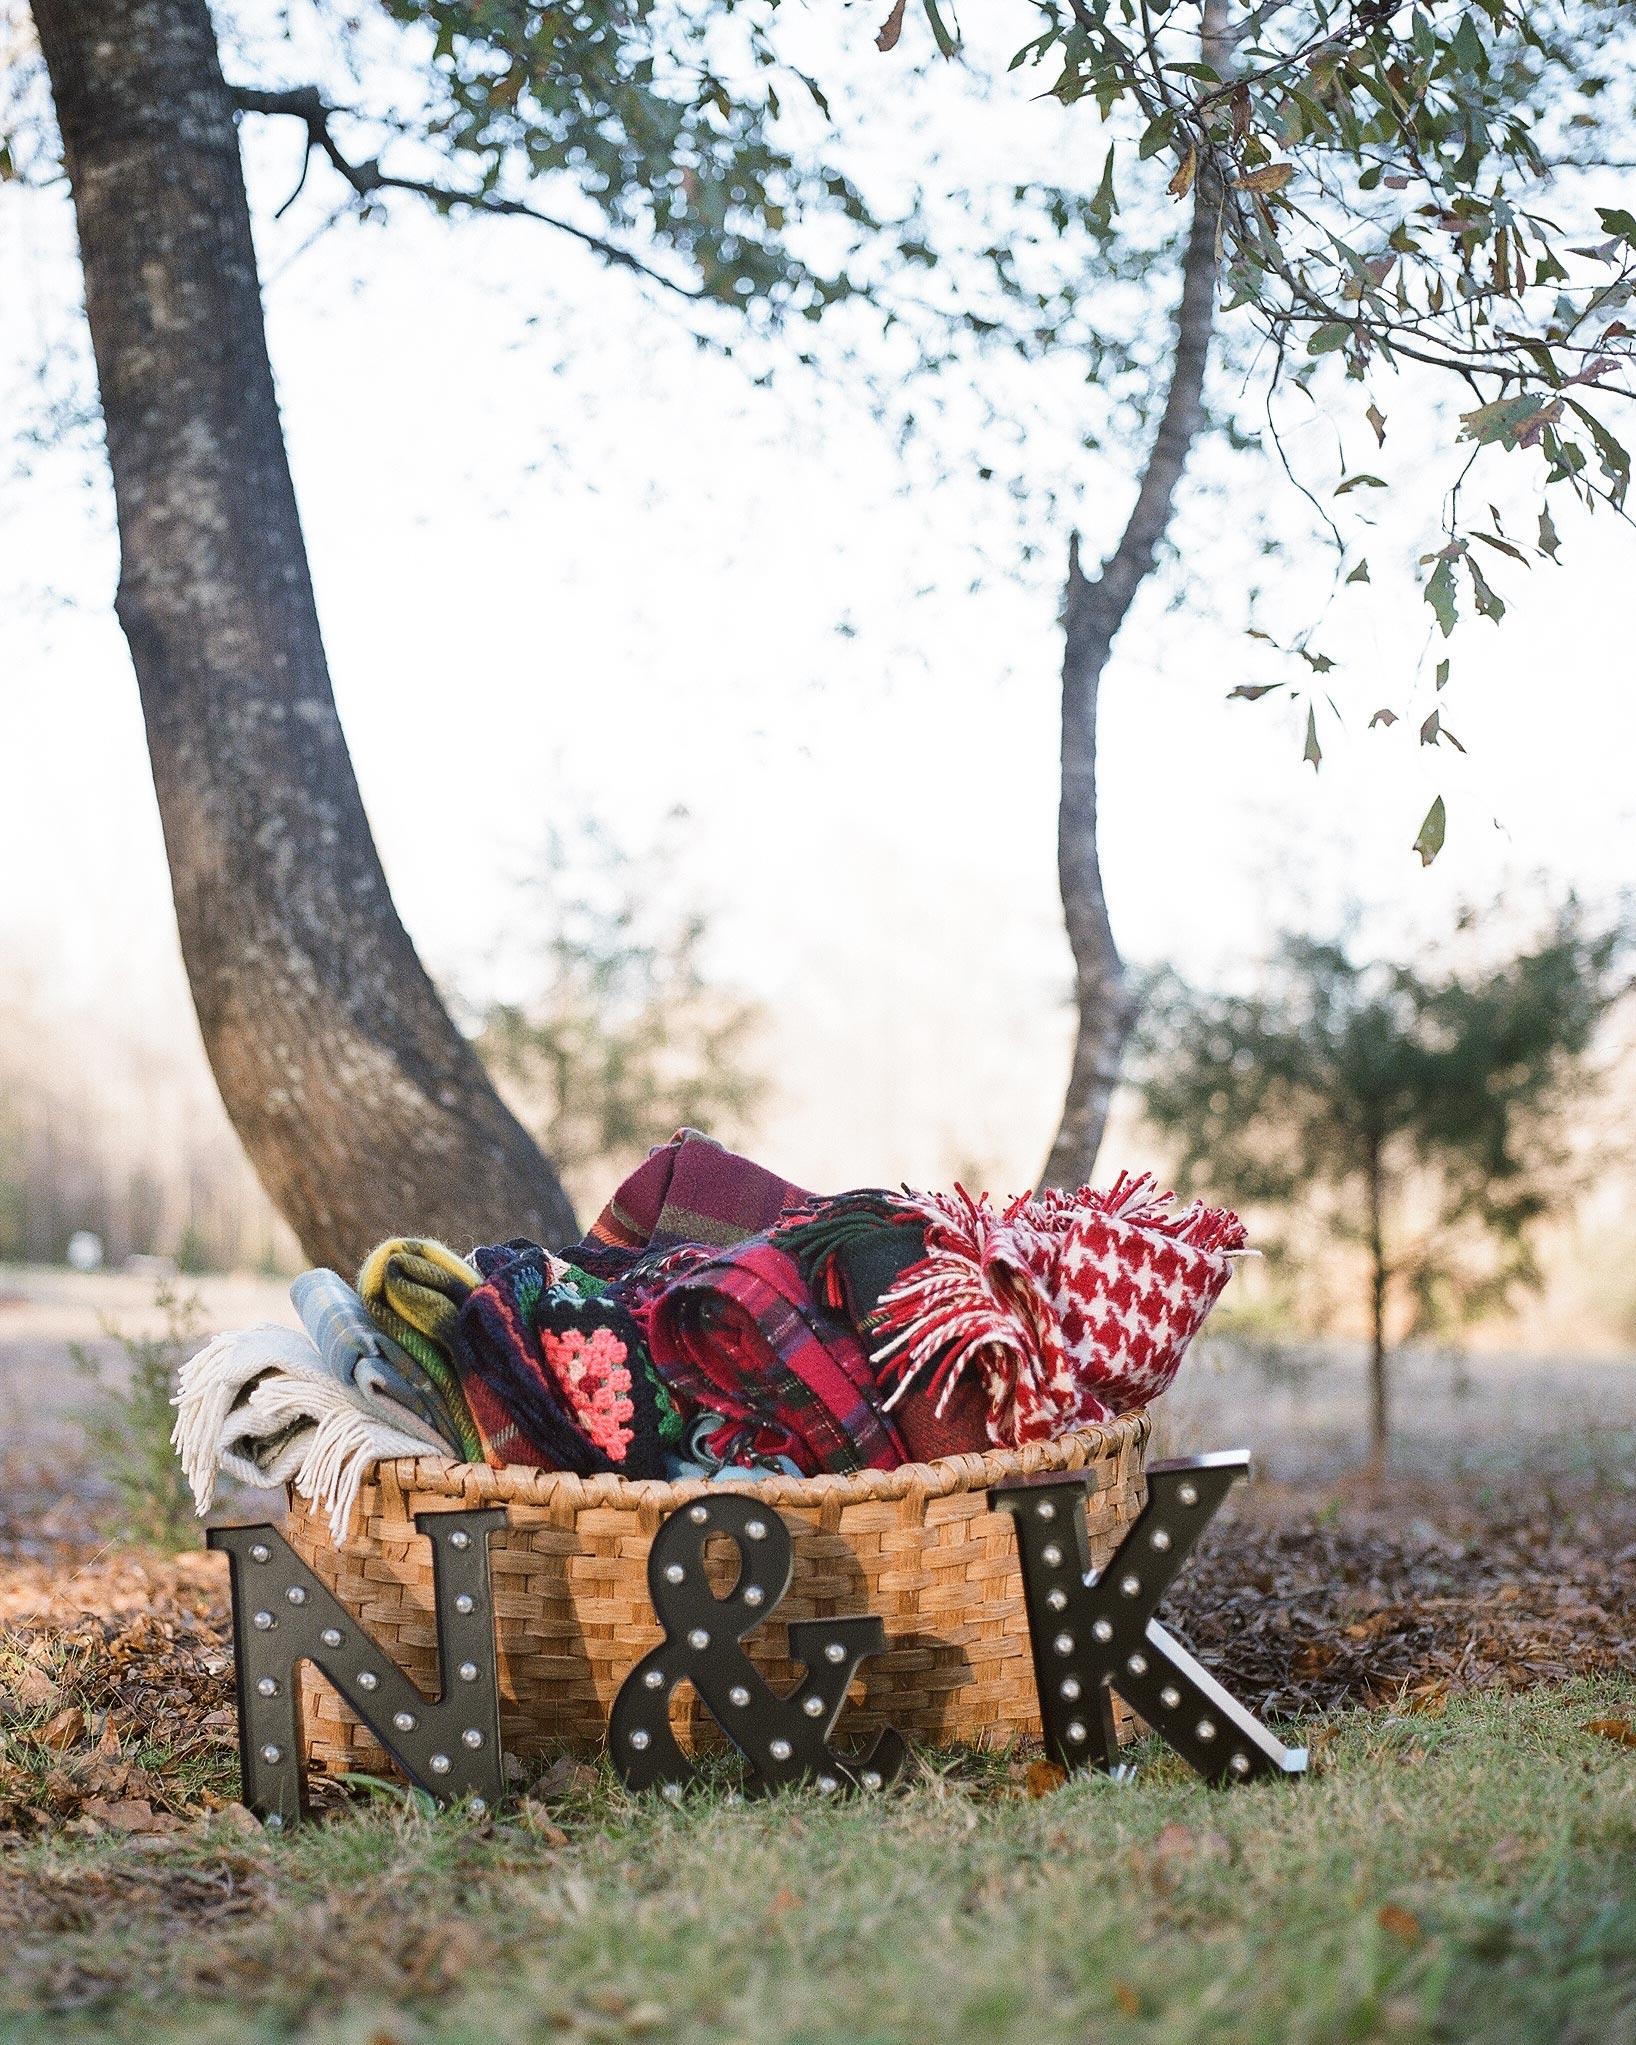 katie-nathan-wedding-thanksgiving-blankets-392-s113017.jpg